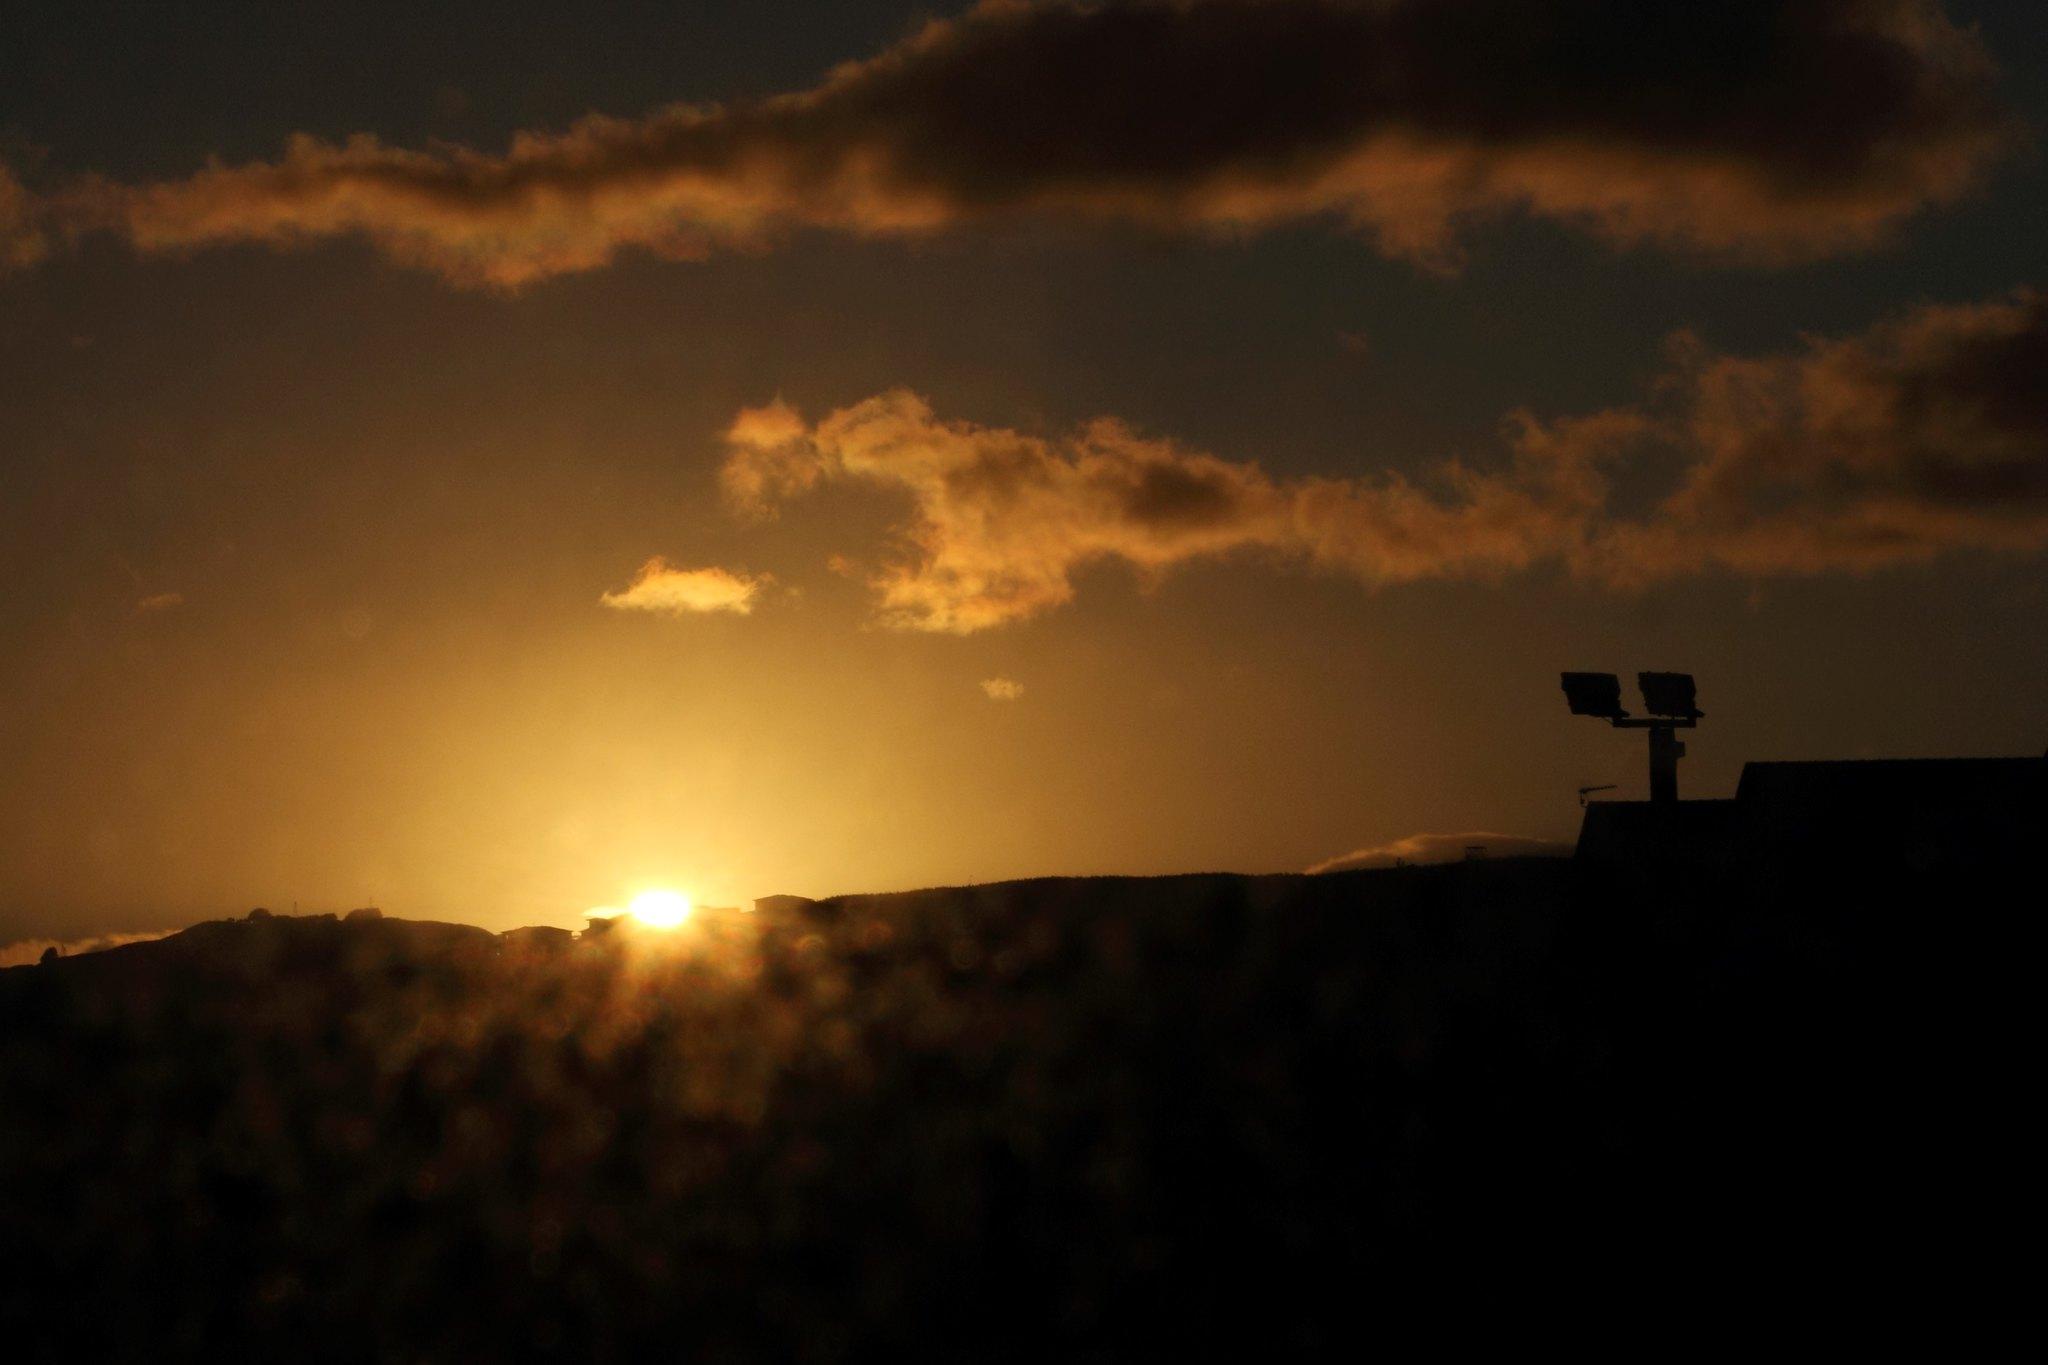 IMG_1790edit (Bright sunrise, dirty window)